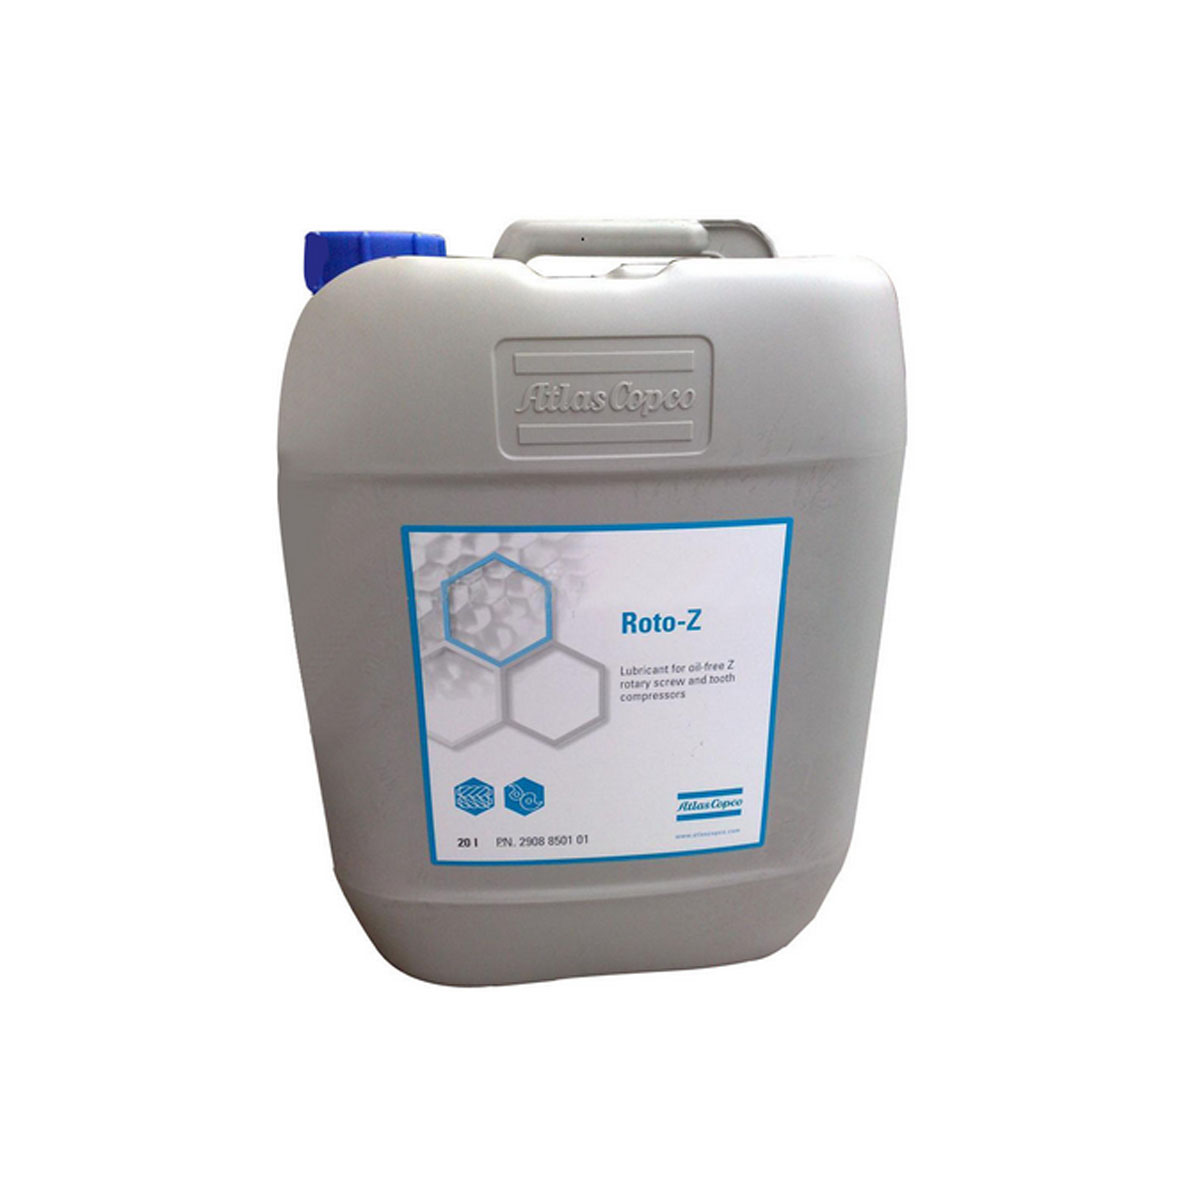 Roto-Z for oil-free Z atlas copco lubricant 2908850101